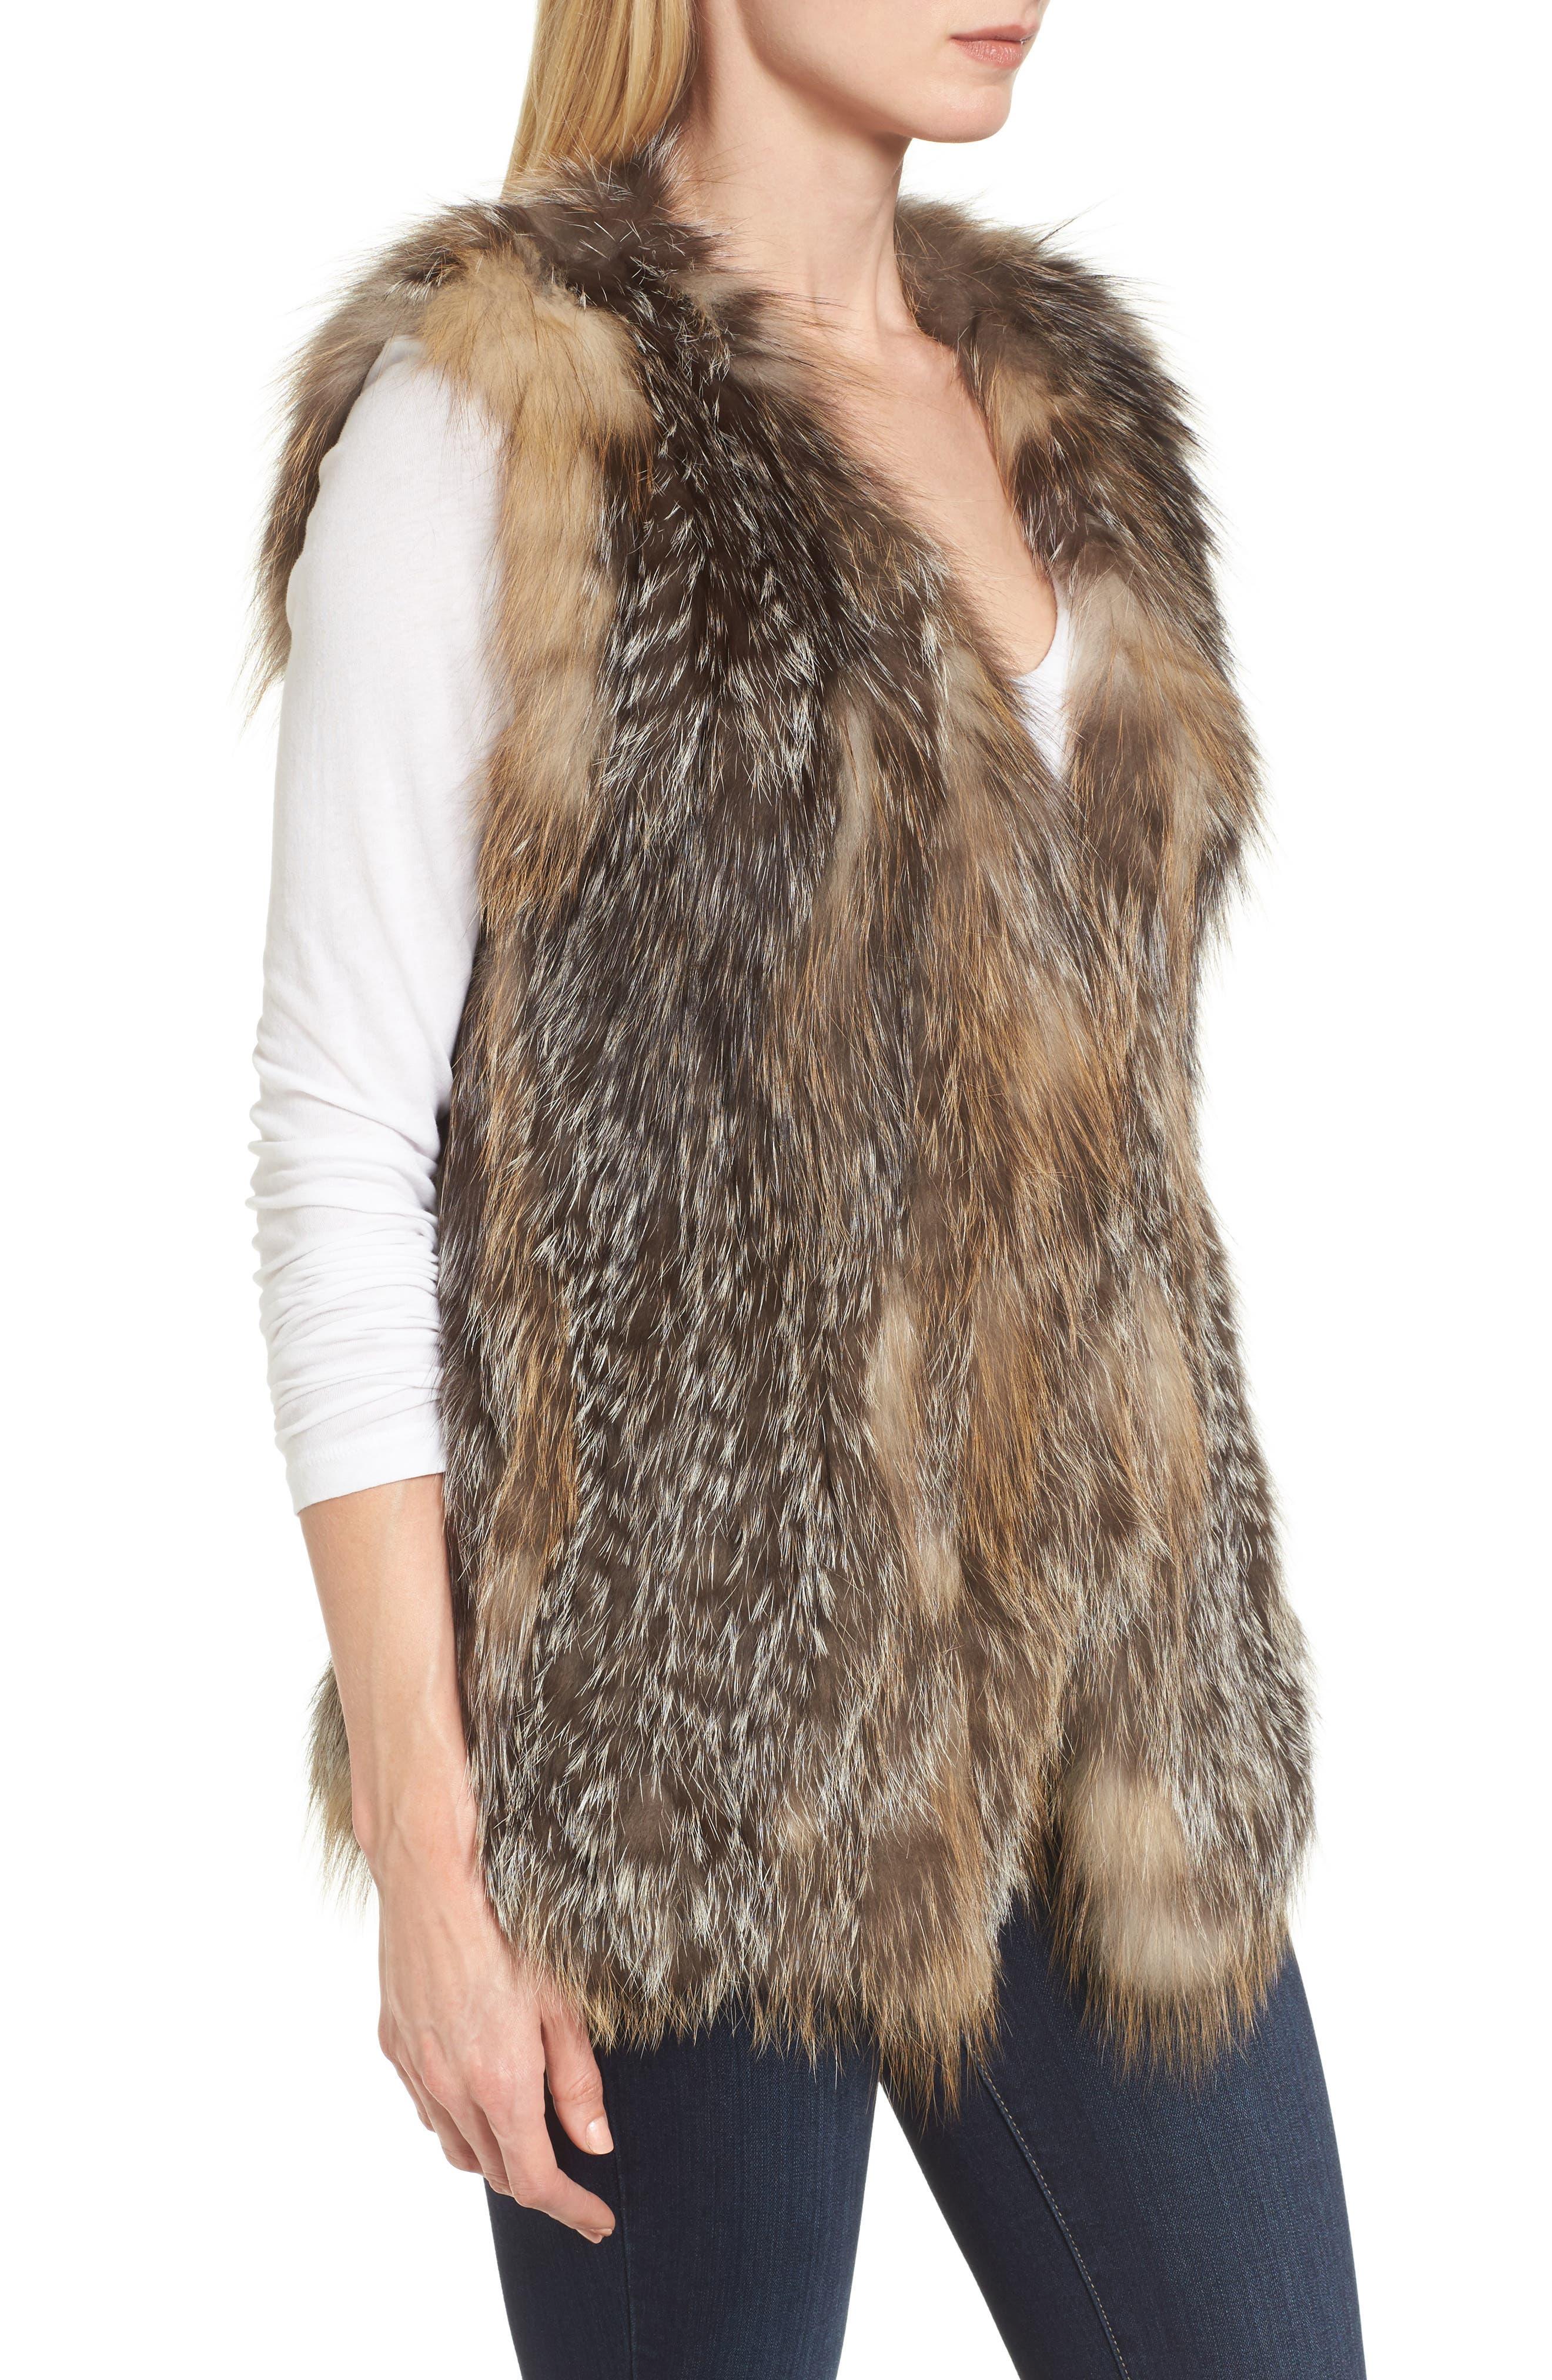 Genuine Fox Fur Vest,                             Alternate thumbnail 3, color,                             Natural Gold